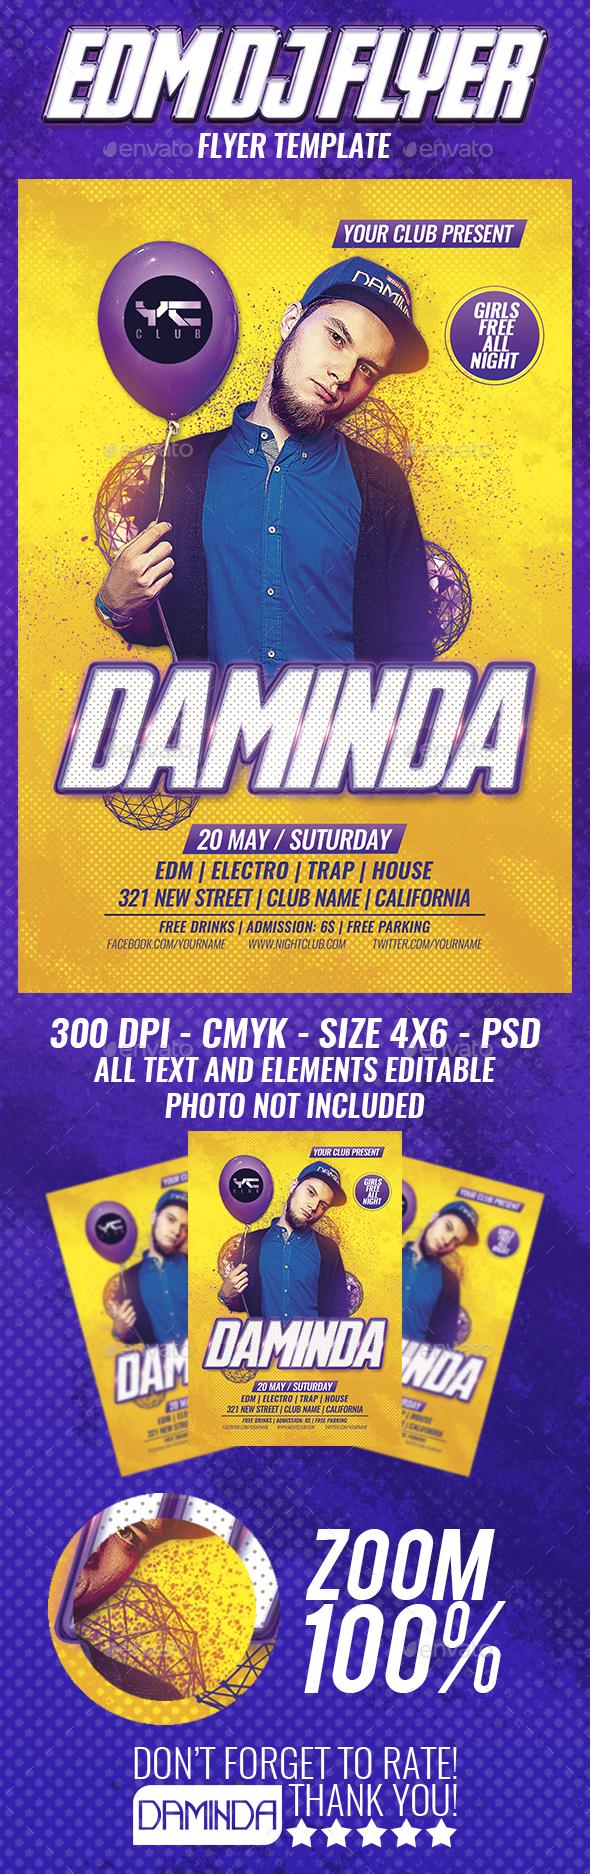 EDM Dj Flyer Template - Clubs & Parties Events